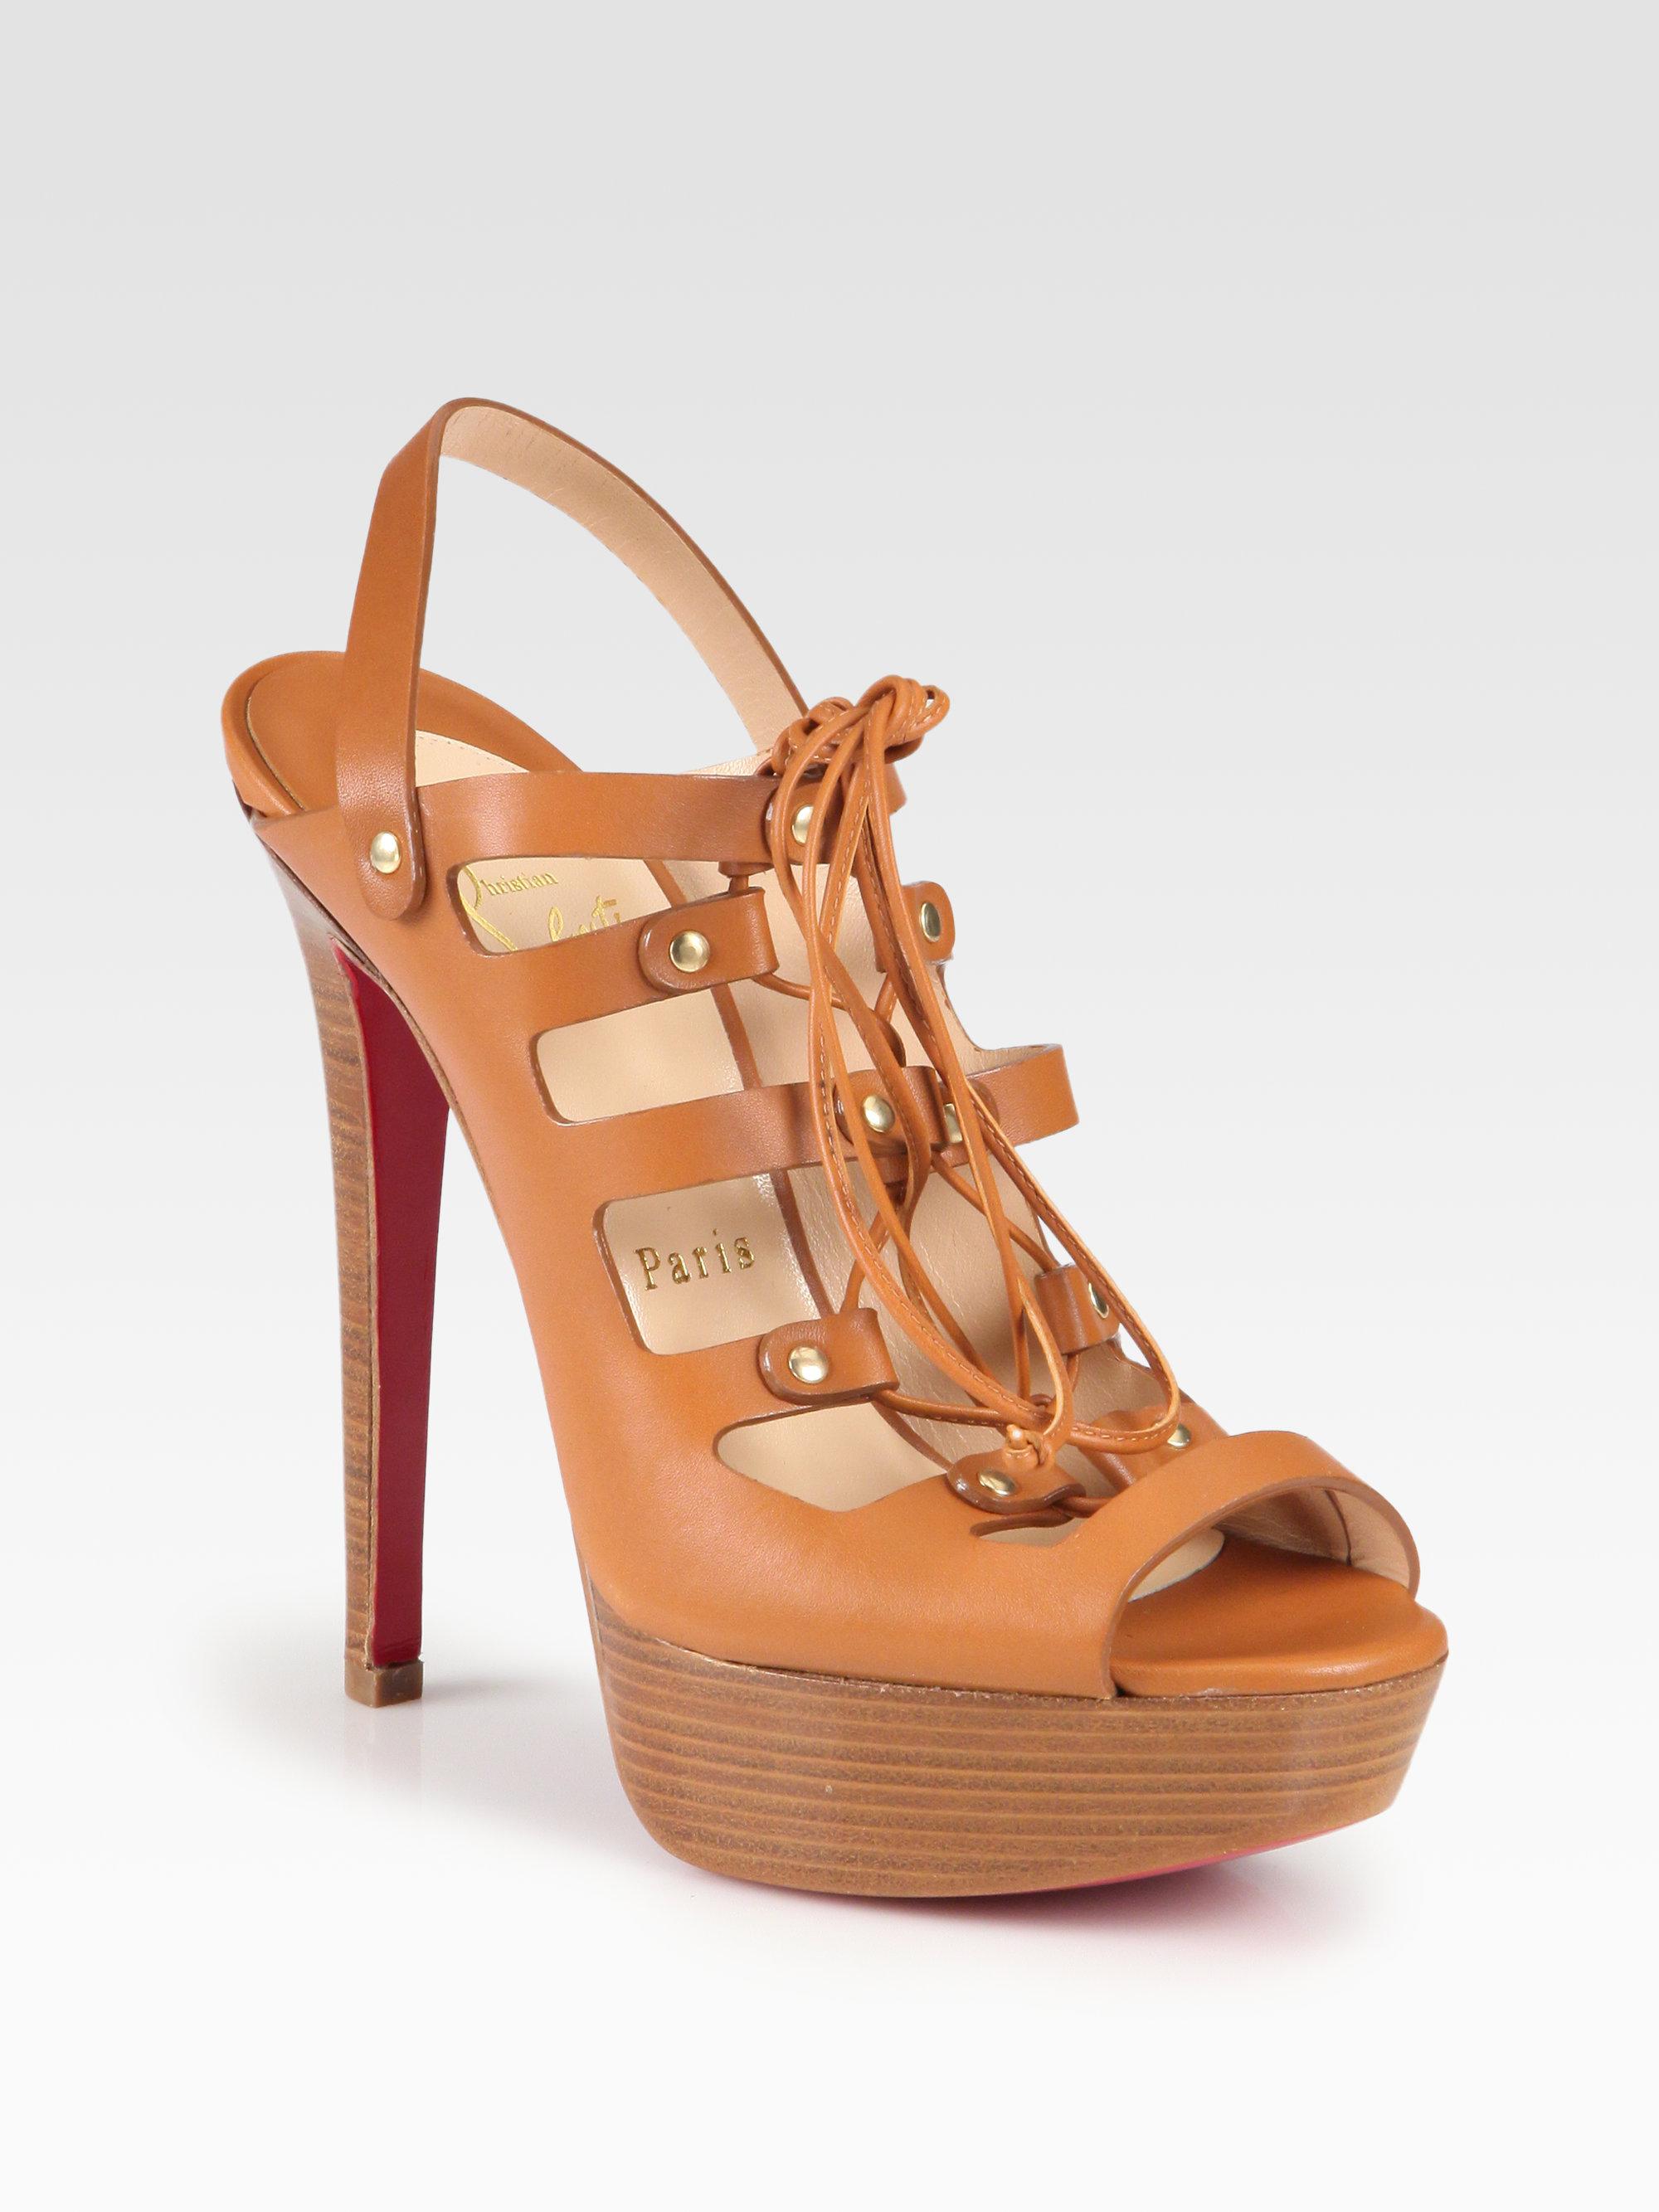 louboutin knockoffs - christian louboutin sandals Tan leather - Bbridges